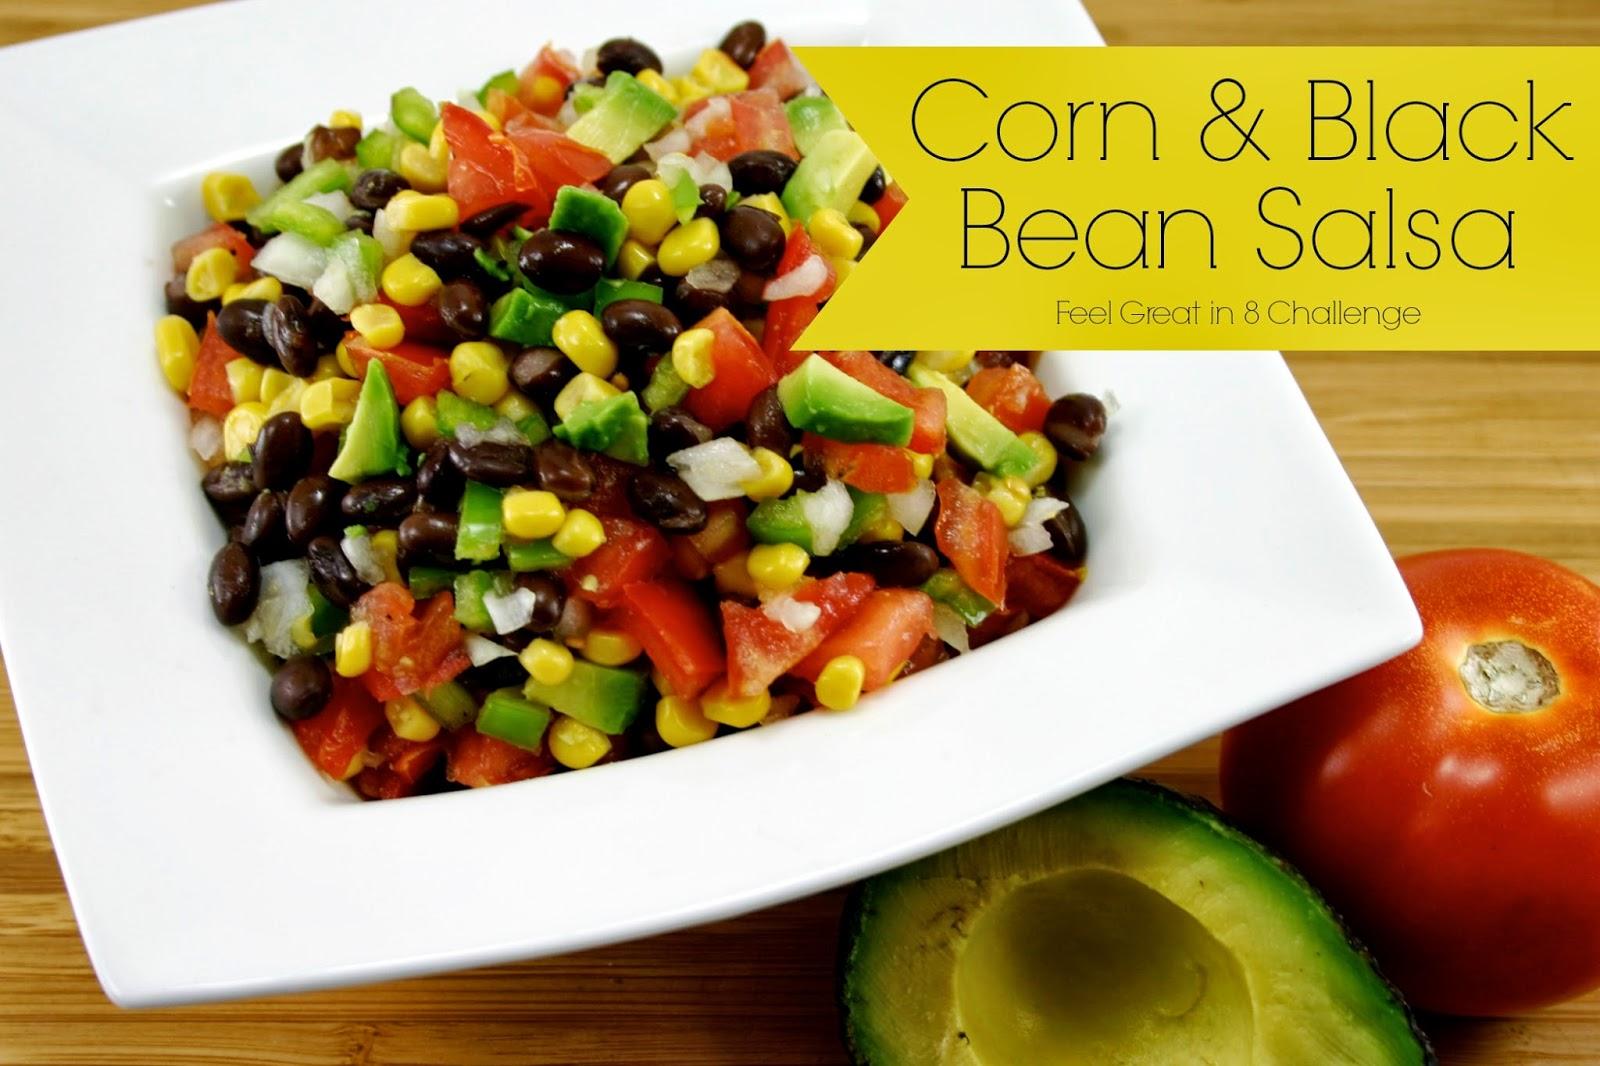 Feel Great In 8!: Corn & Black Bean Salsa